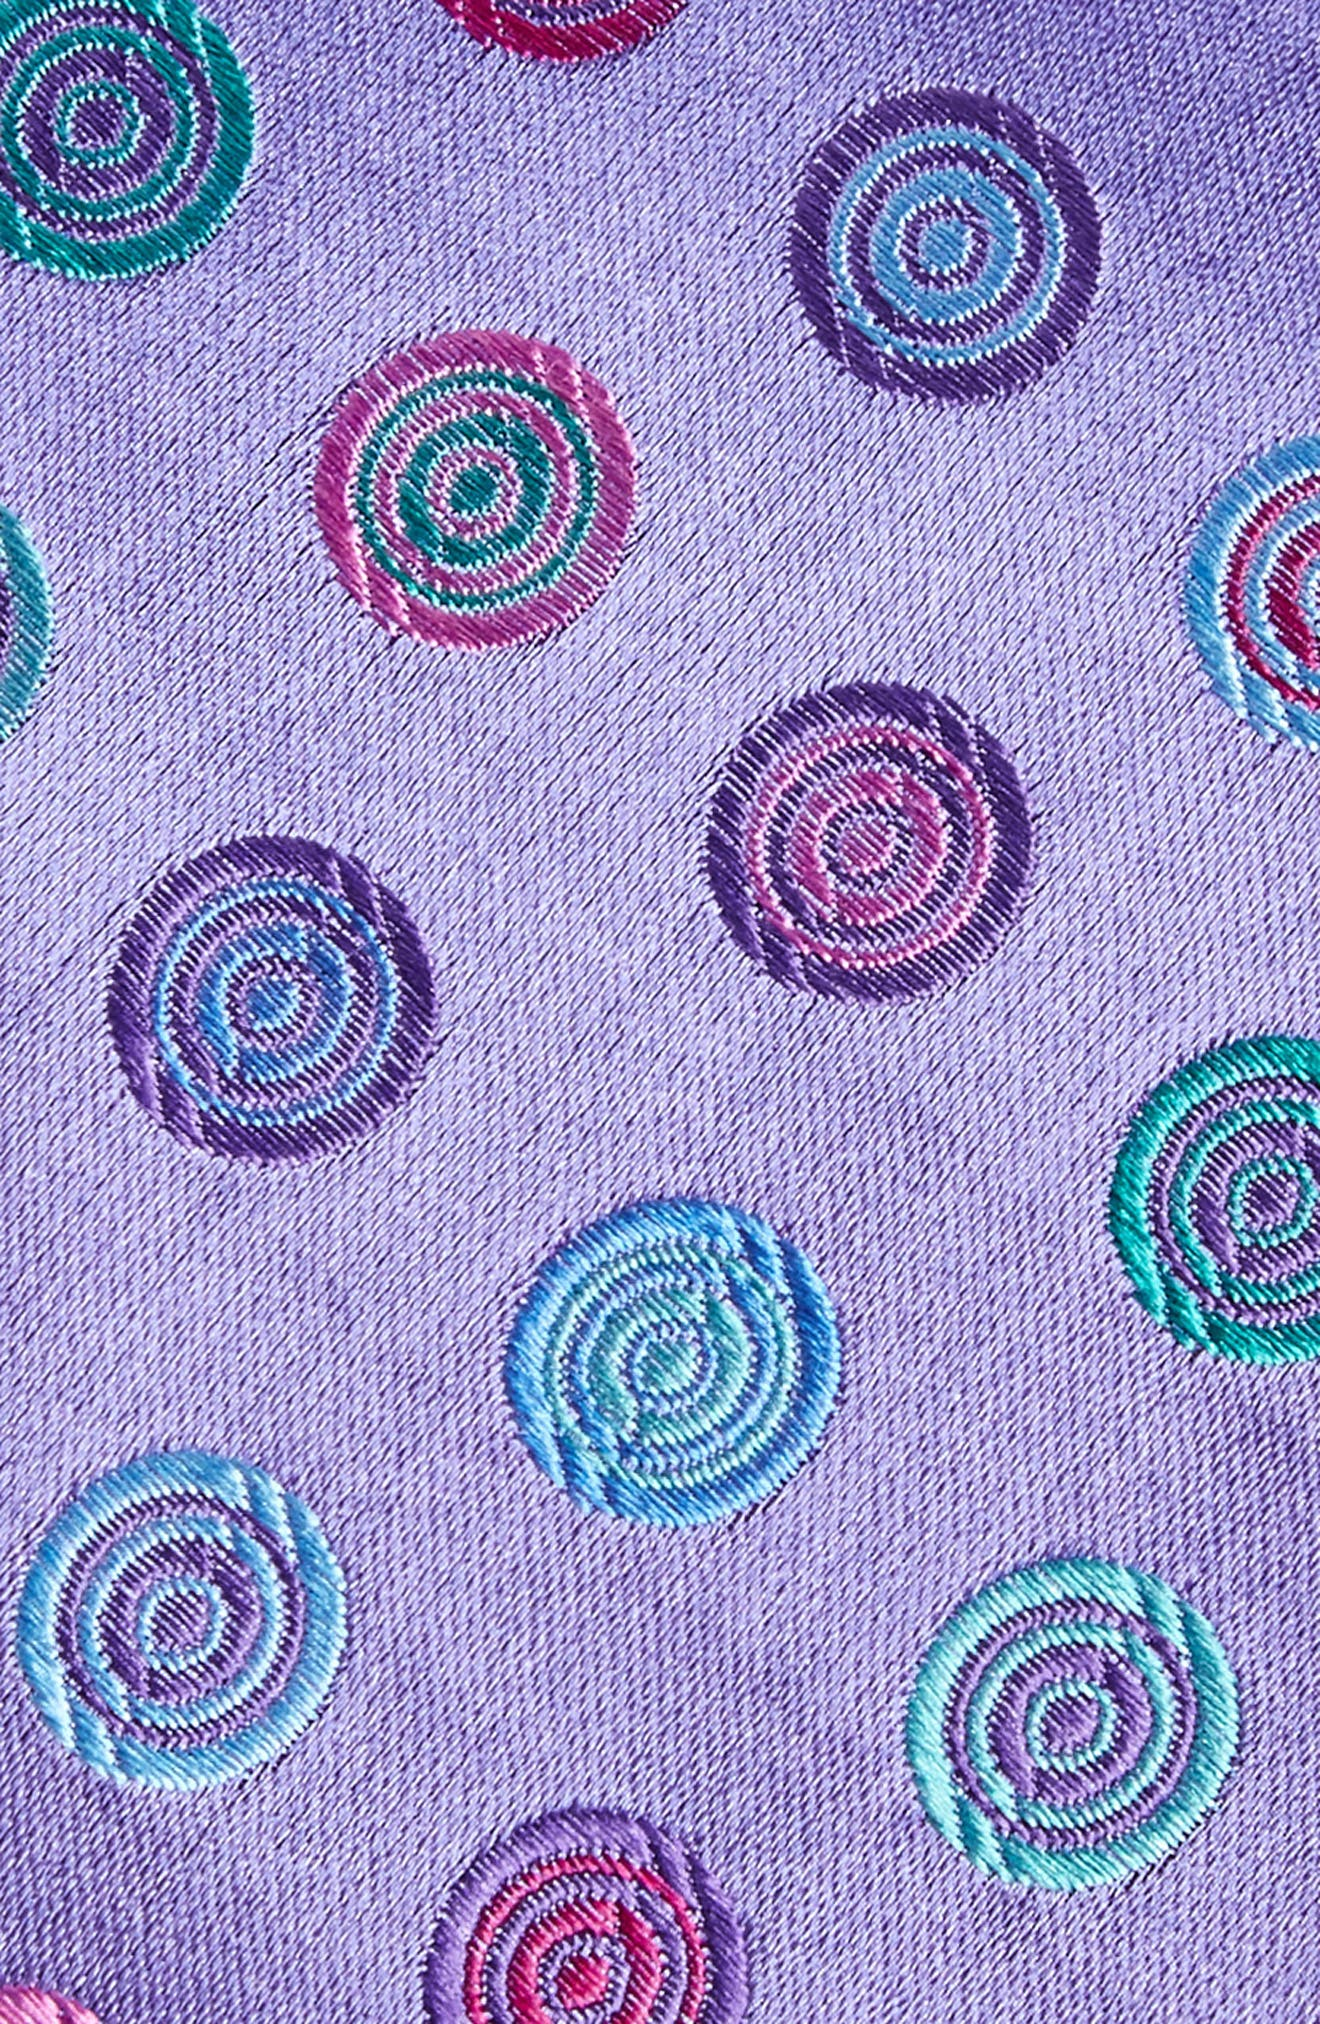 Santa Lucia Medallion Silk Tie,                             Alternate thumbnail 2, color,                             LILAC